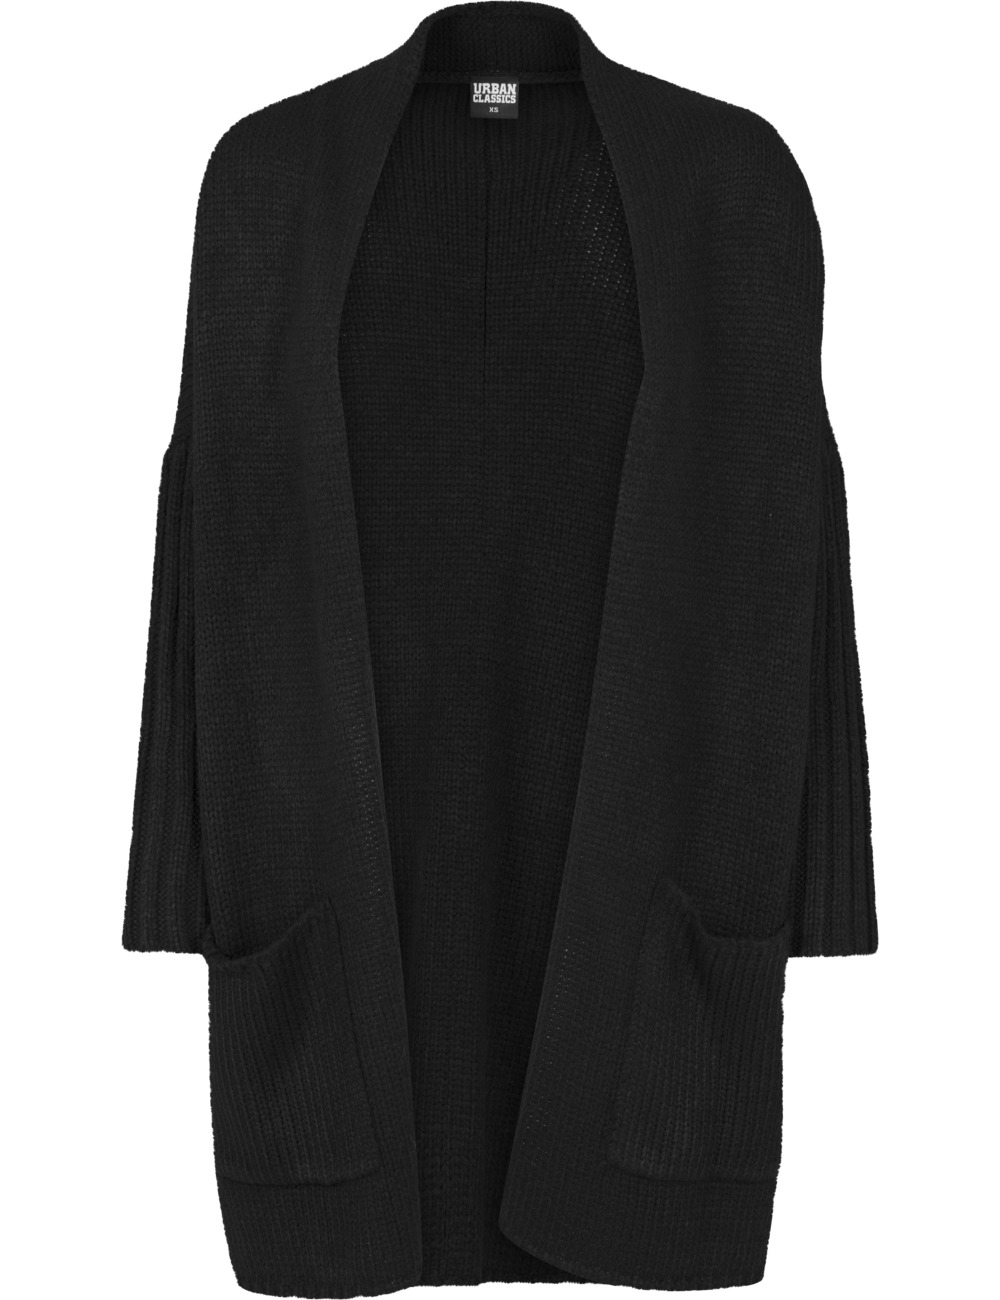 Urban Classics Damen Strickjacke Oversized Cardigan